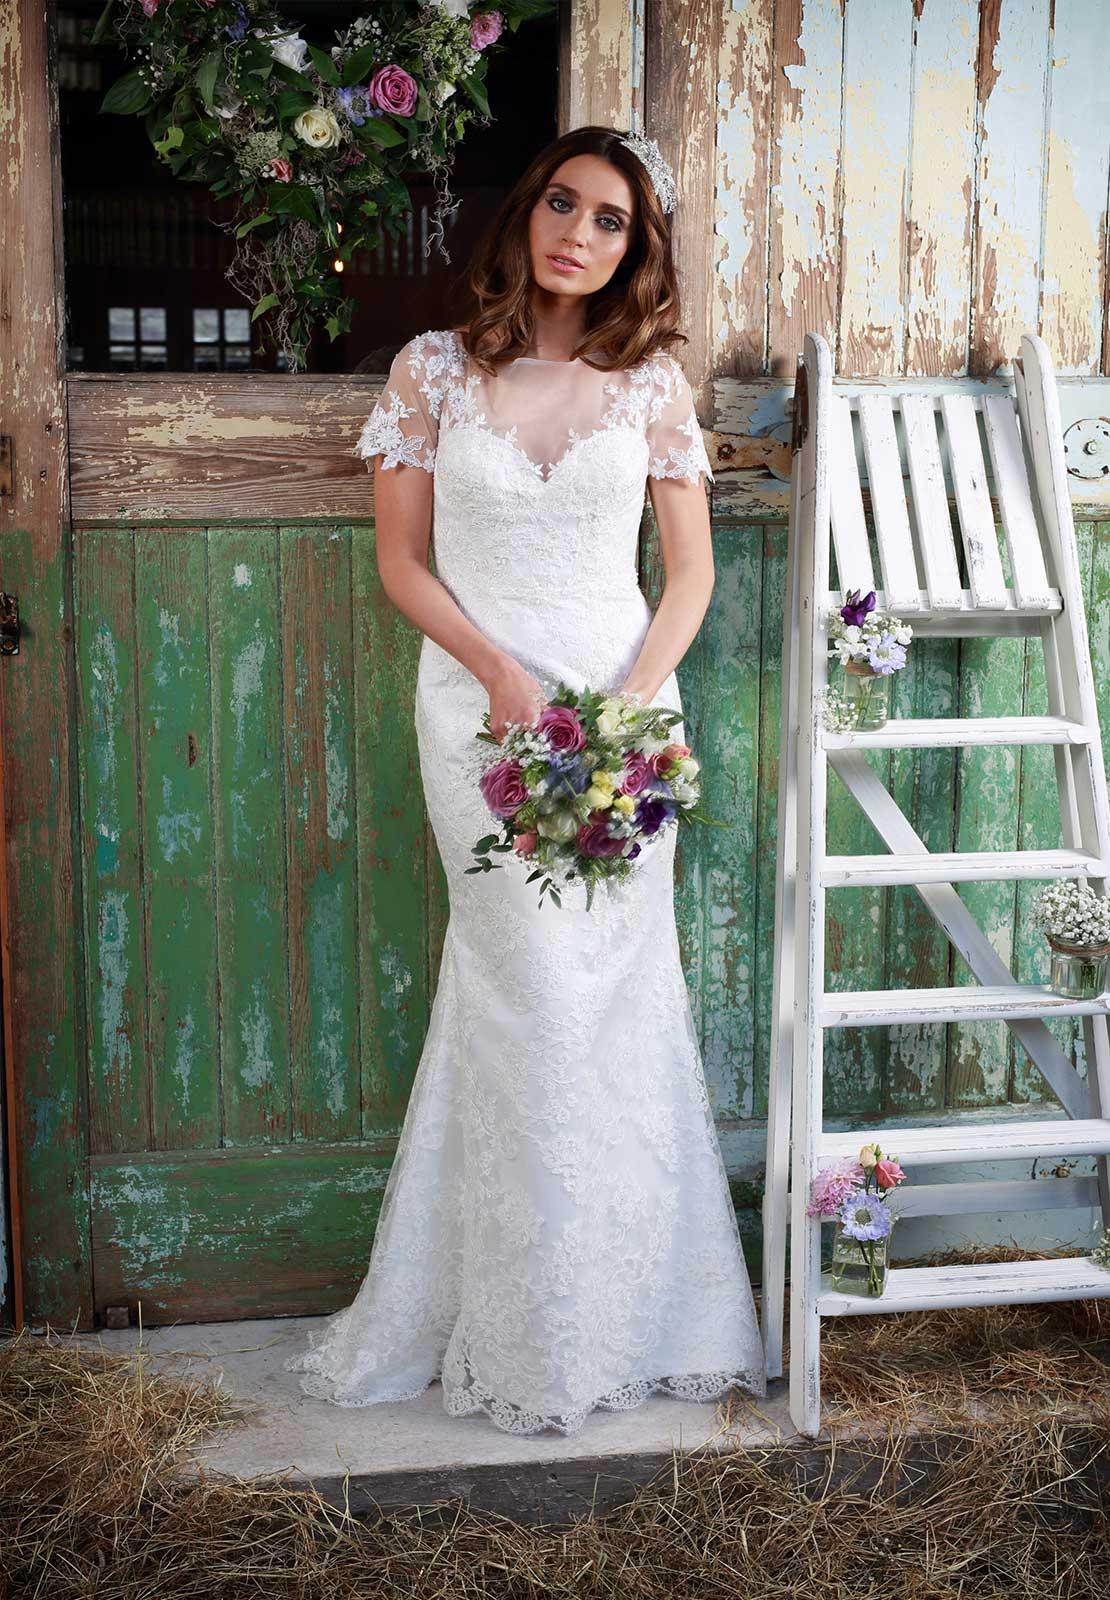 amanda wyatt bridal wedding dress designer